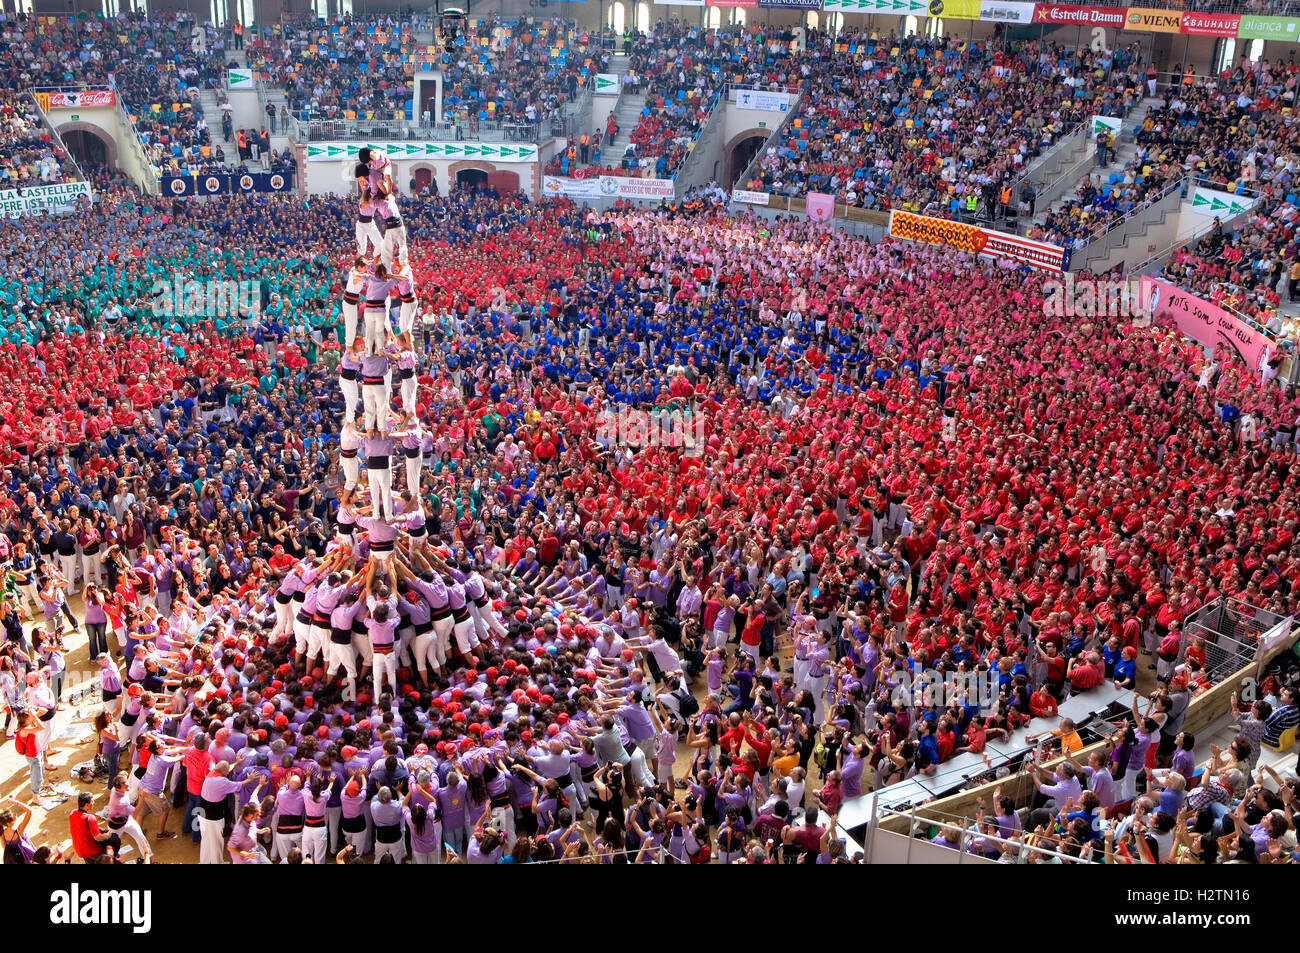 Colla Jove Xiquets de Tarragona.'Castellers' building human tower, a Catalan tradition.Biannual contest. - Stock Image